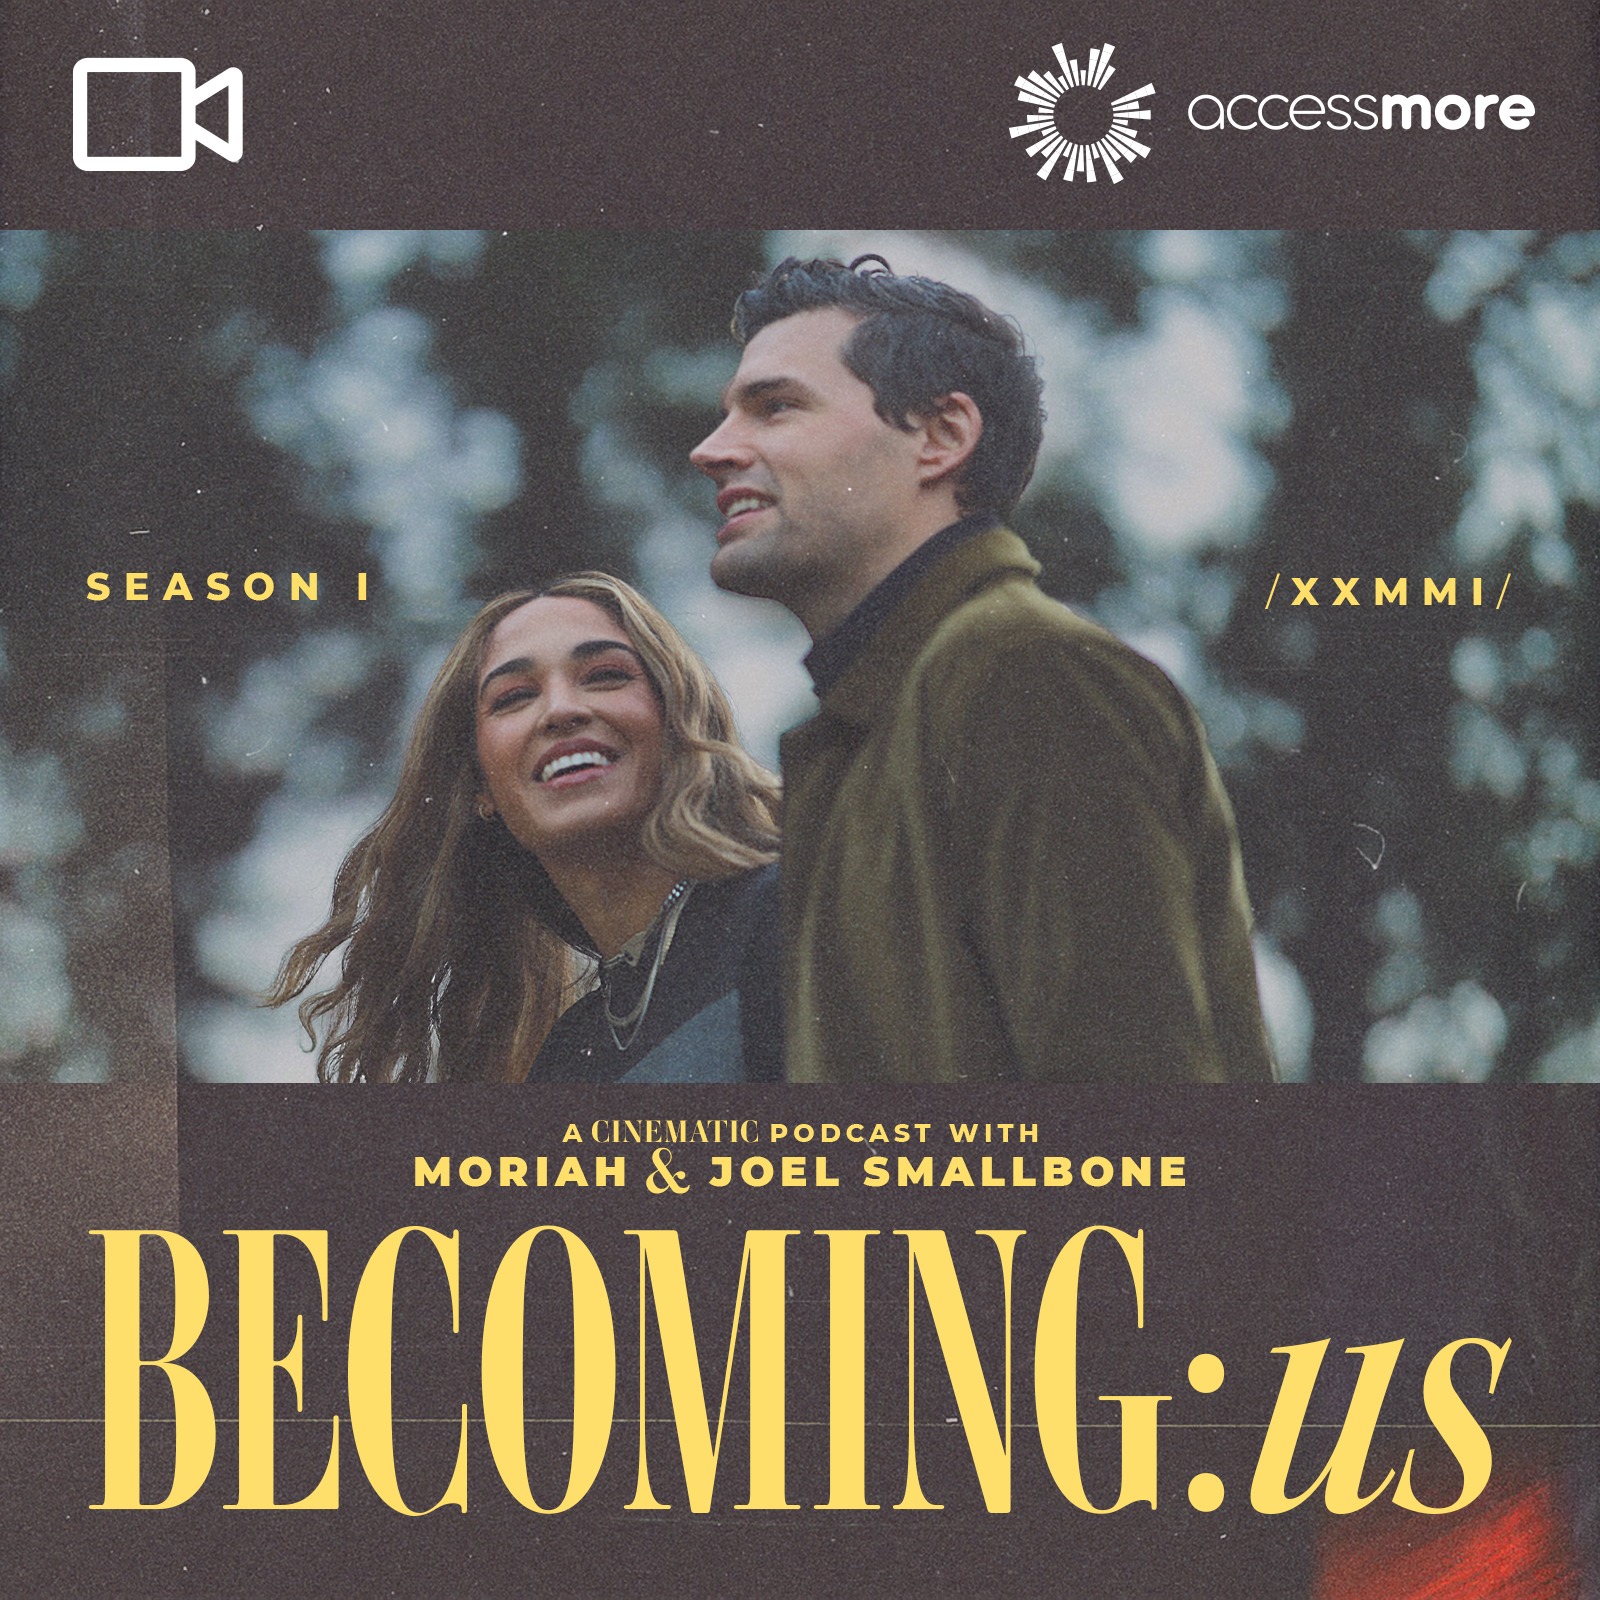 BECOMING:us with Moriah & Joel Smallbone VIDEO